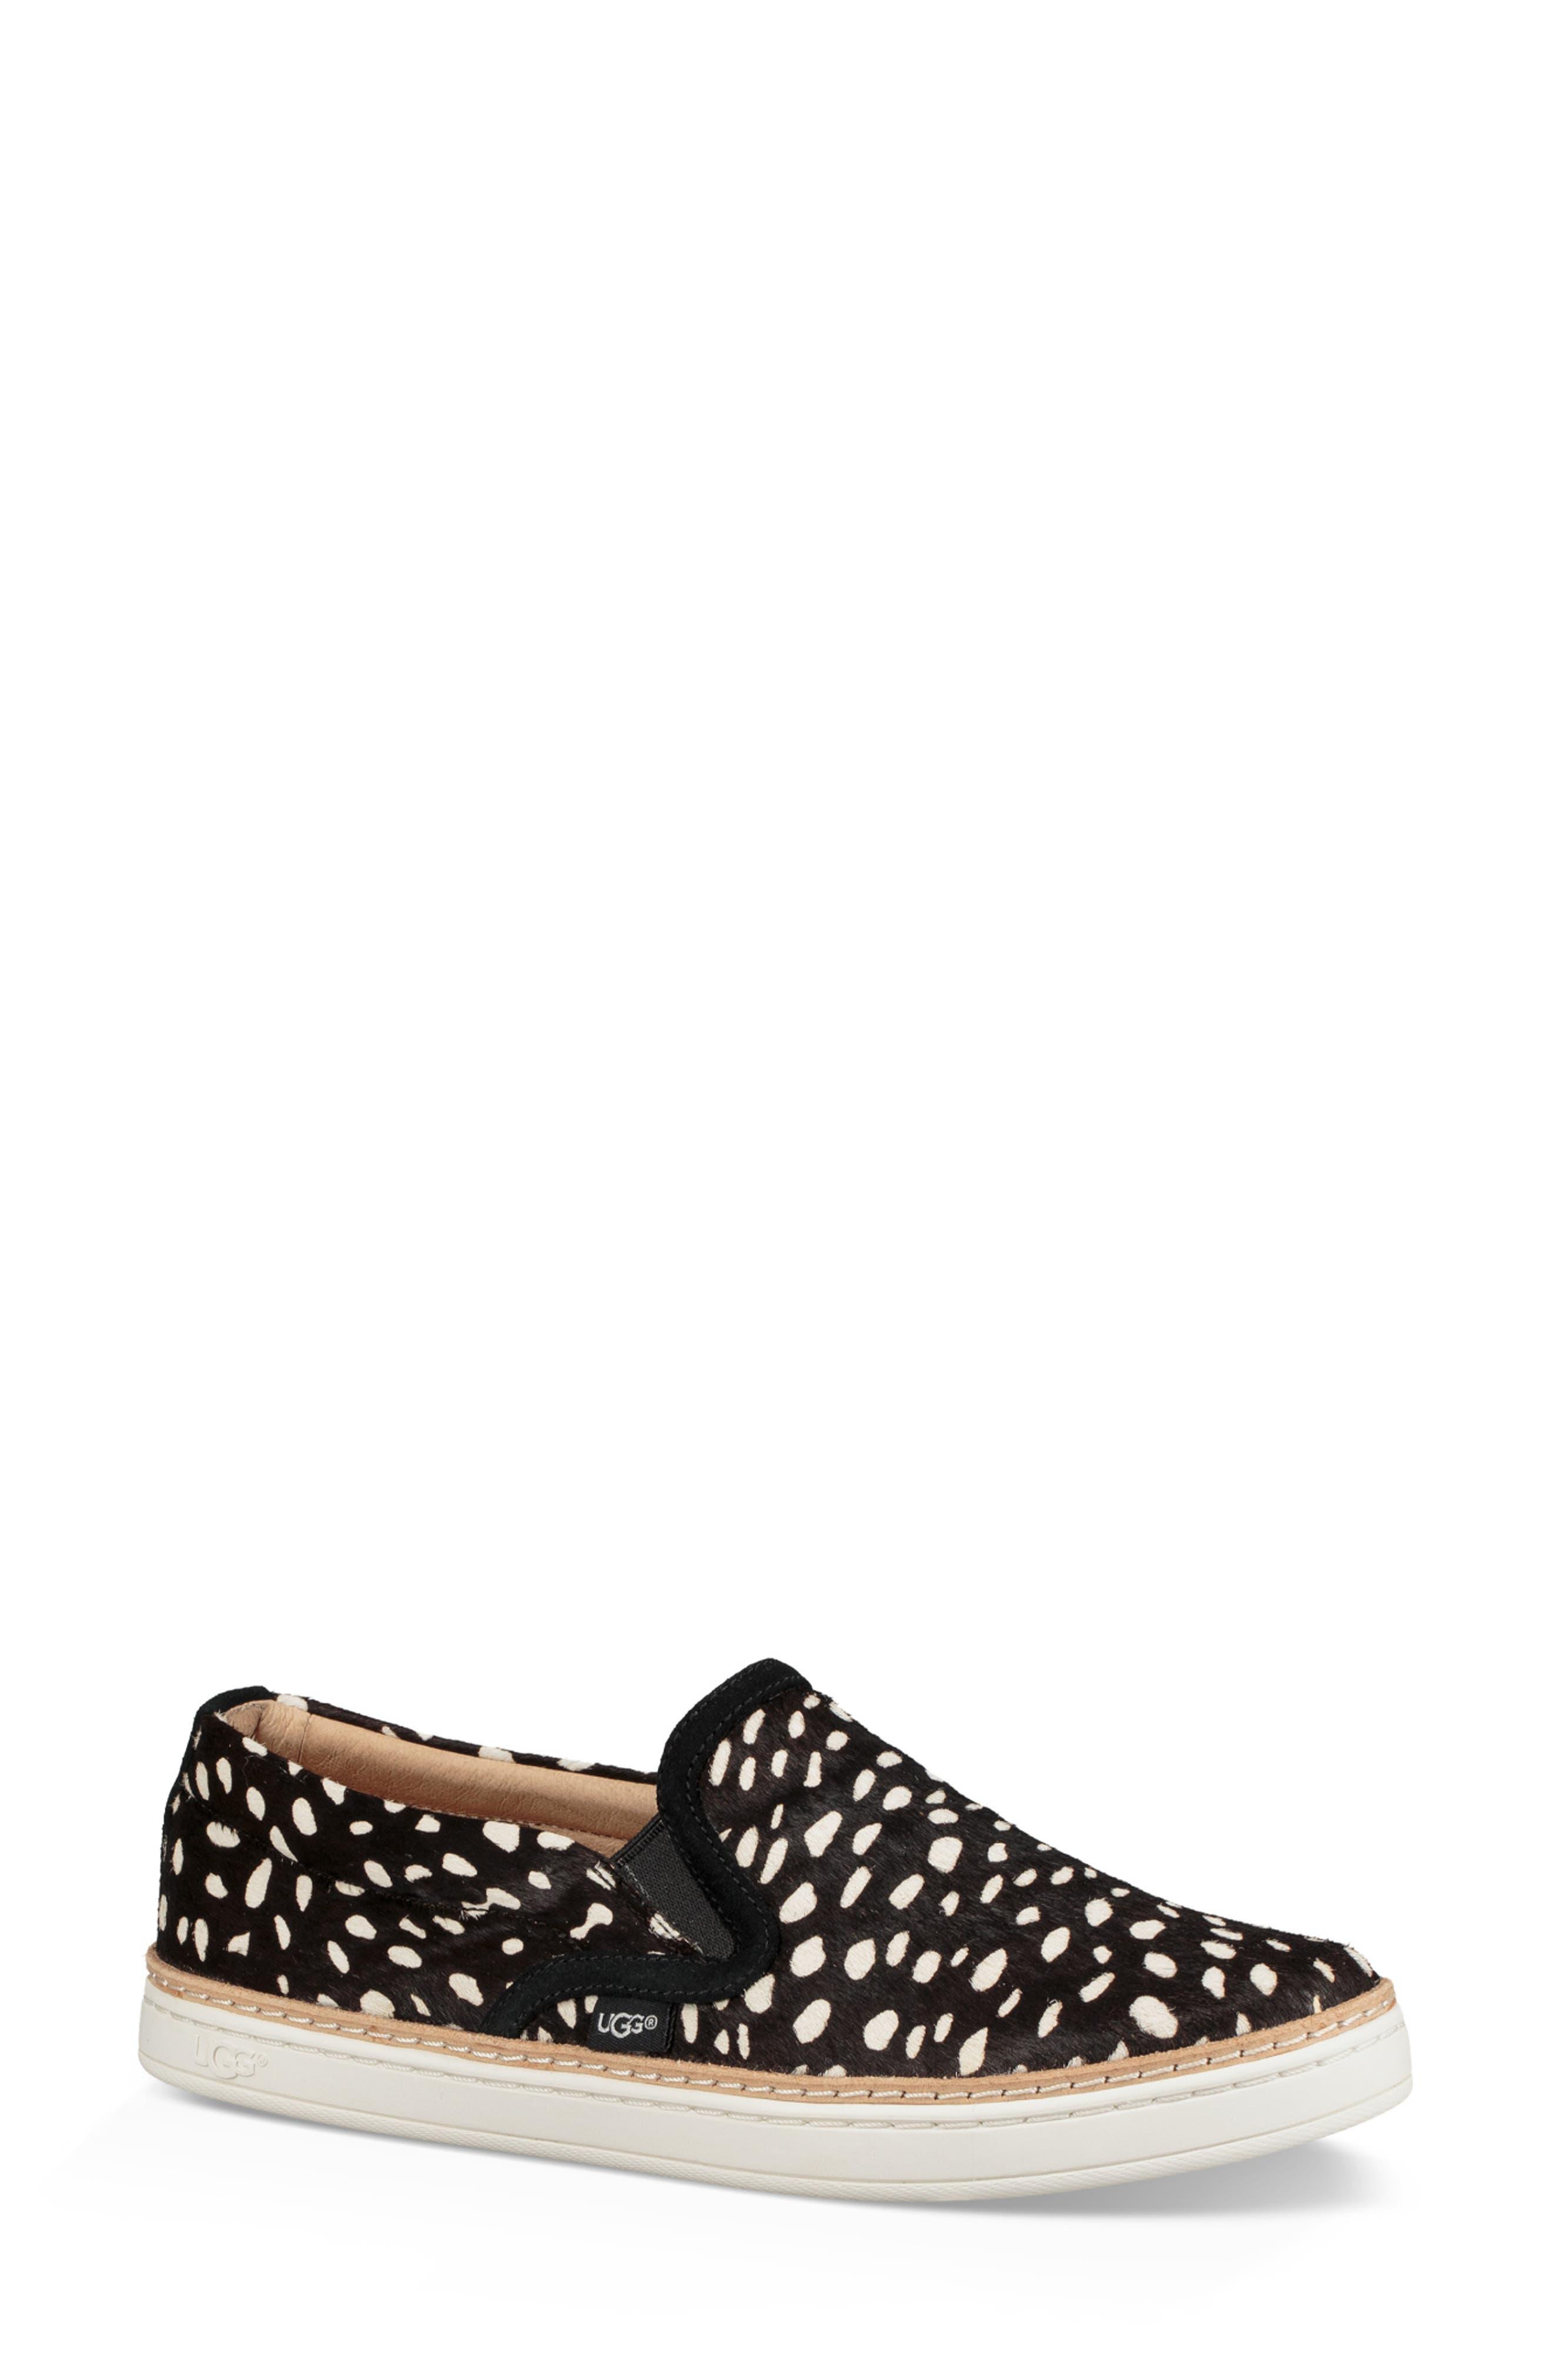 Soleda Genuine Calf Hair Slip-On Sneaker,                         Main,                         color, BLACK